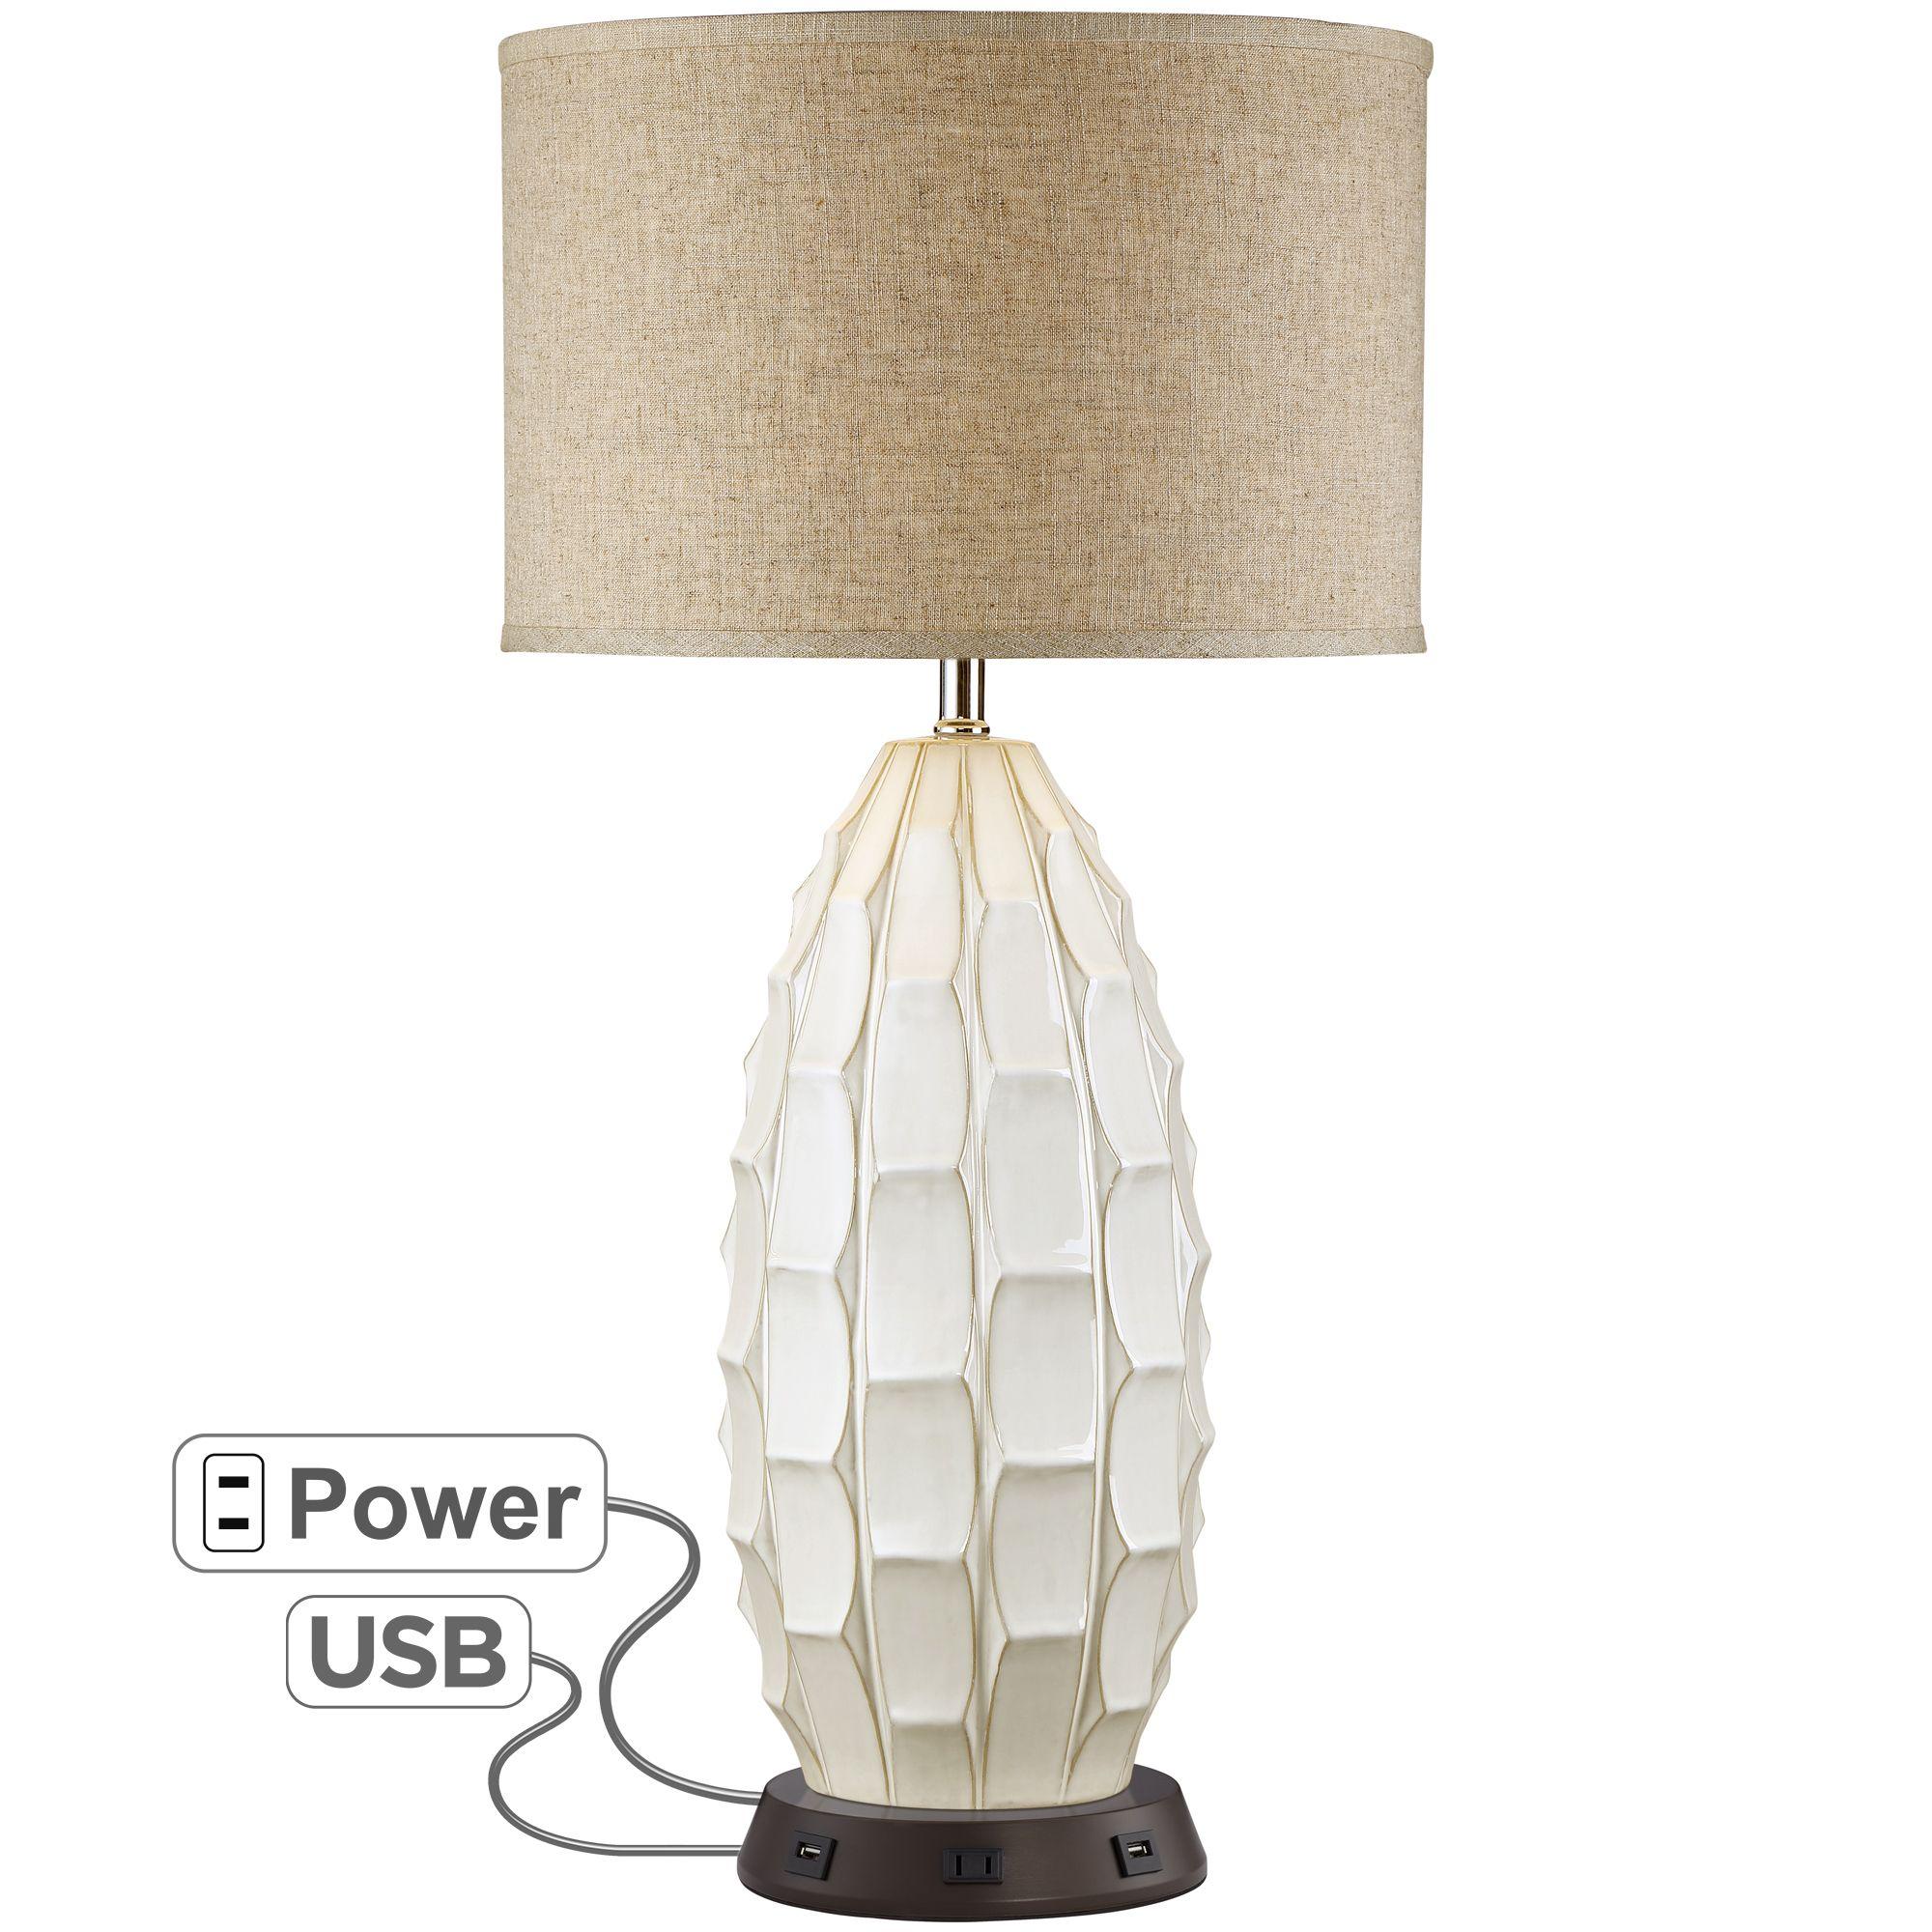 Possini Euro Design Mid Century Modern Table Lamp with USB ...